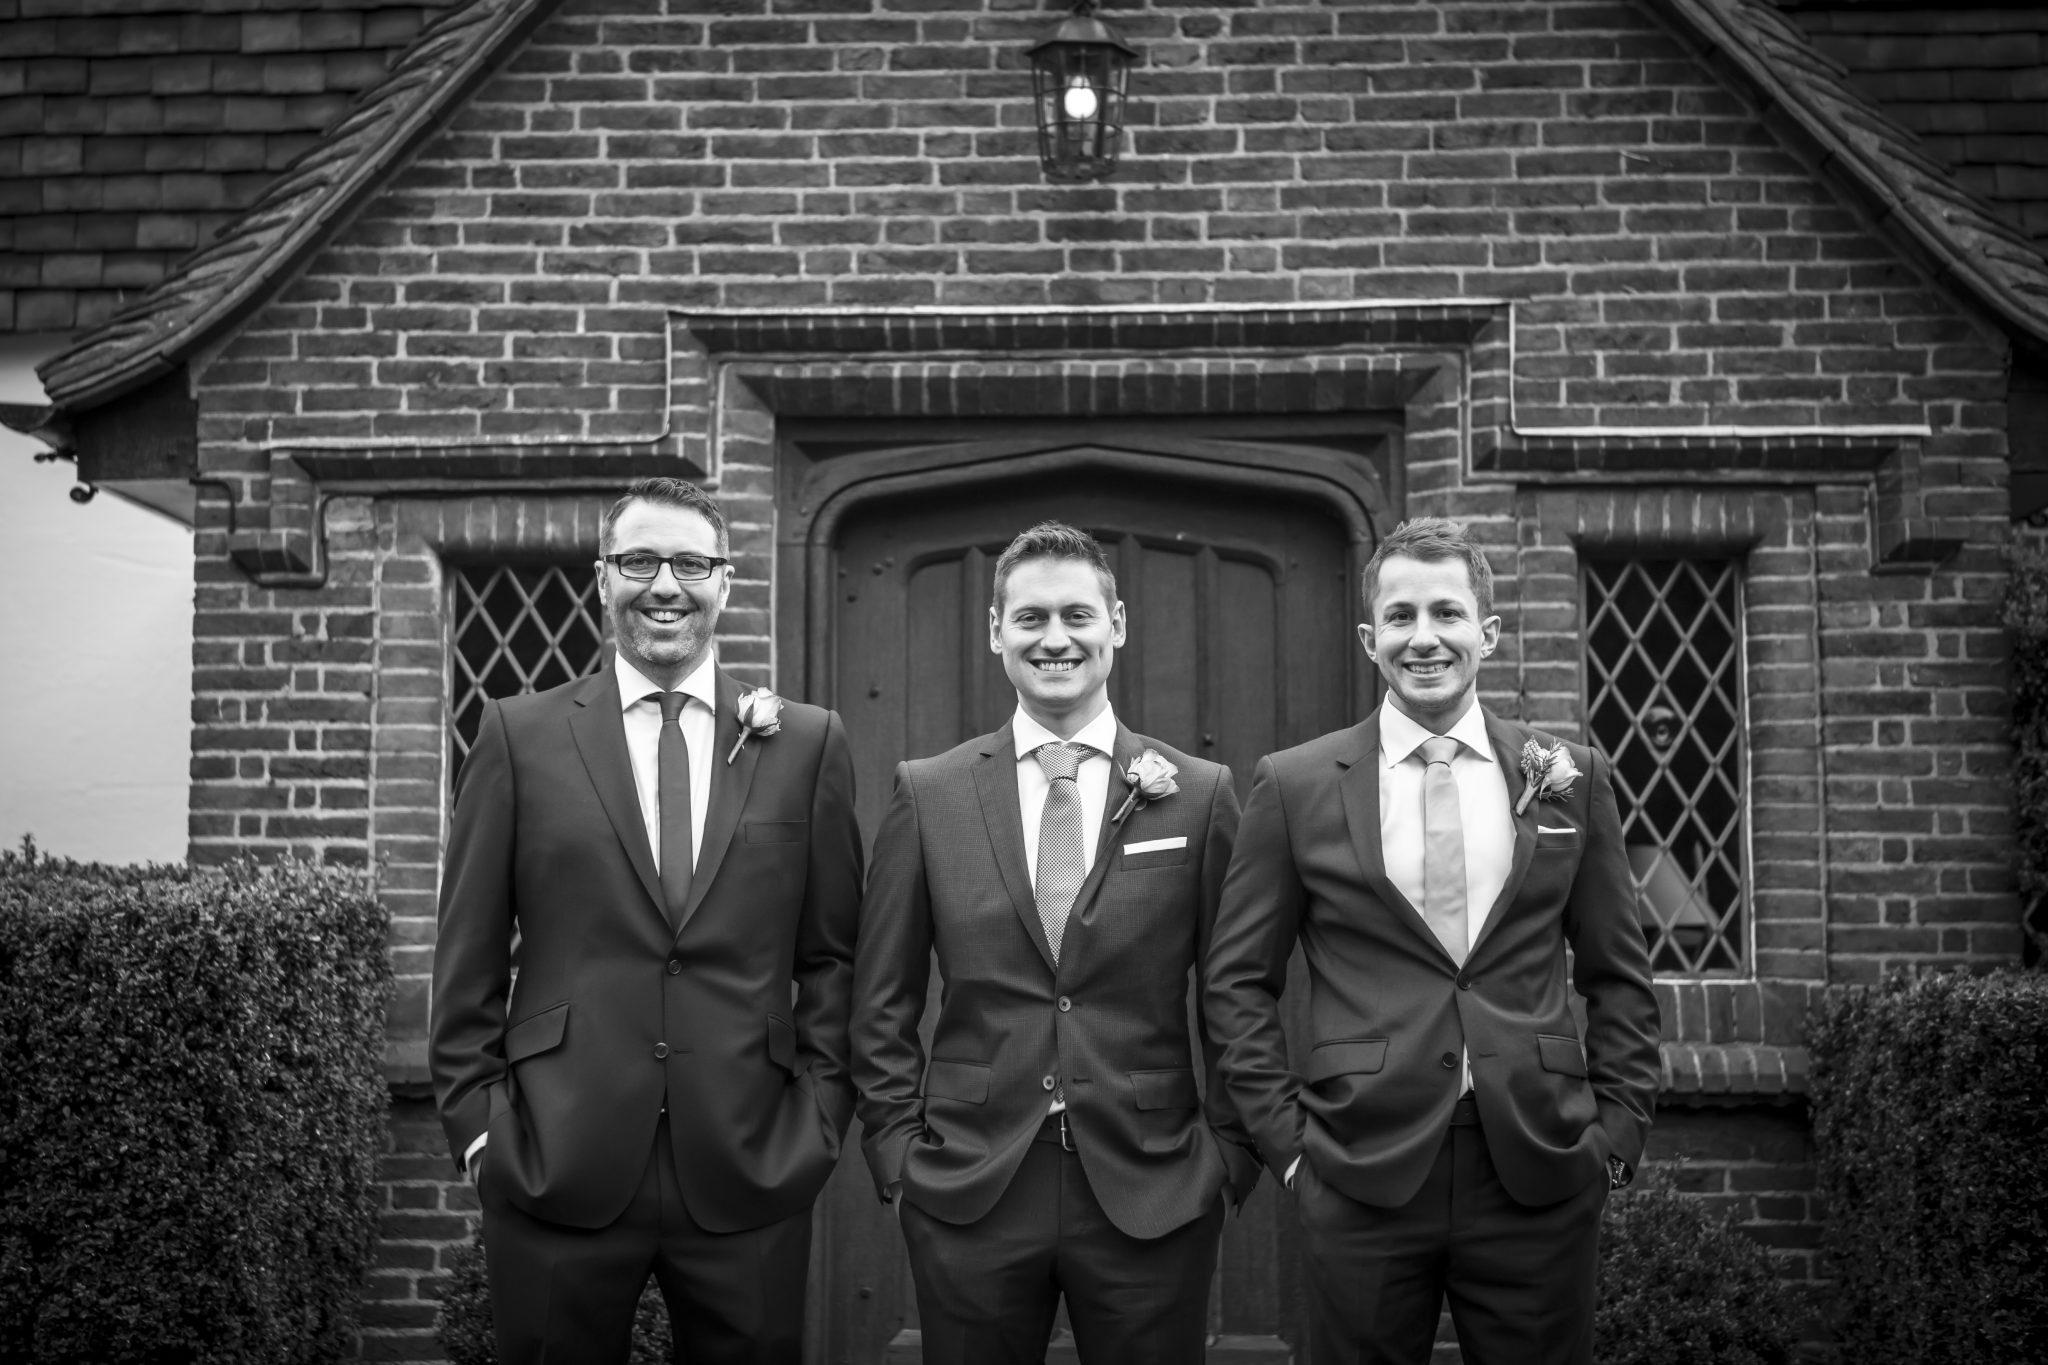 Groomsmen posing before wedding at Oaks Farm Weddings, Shirley Croydon